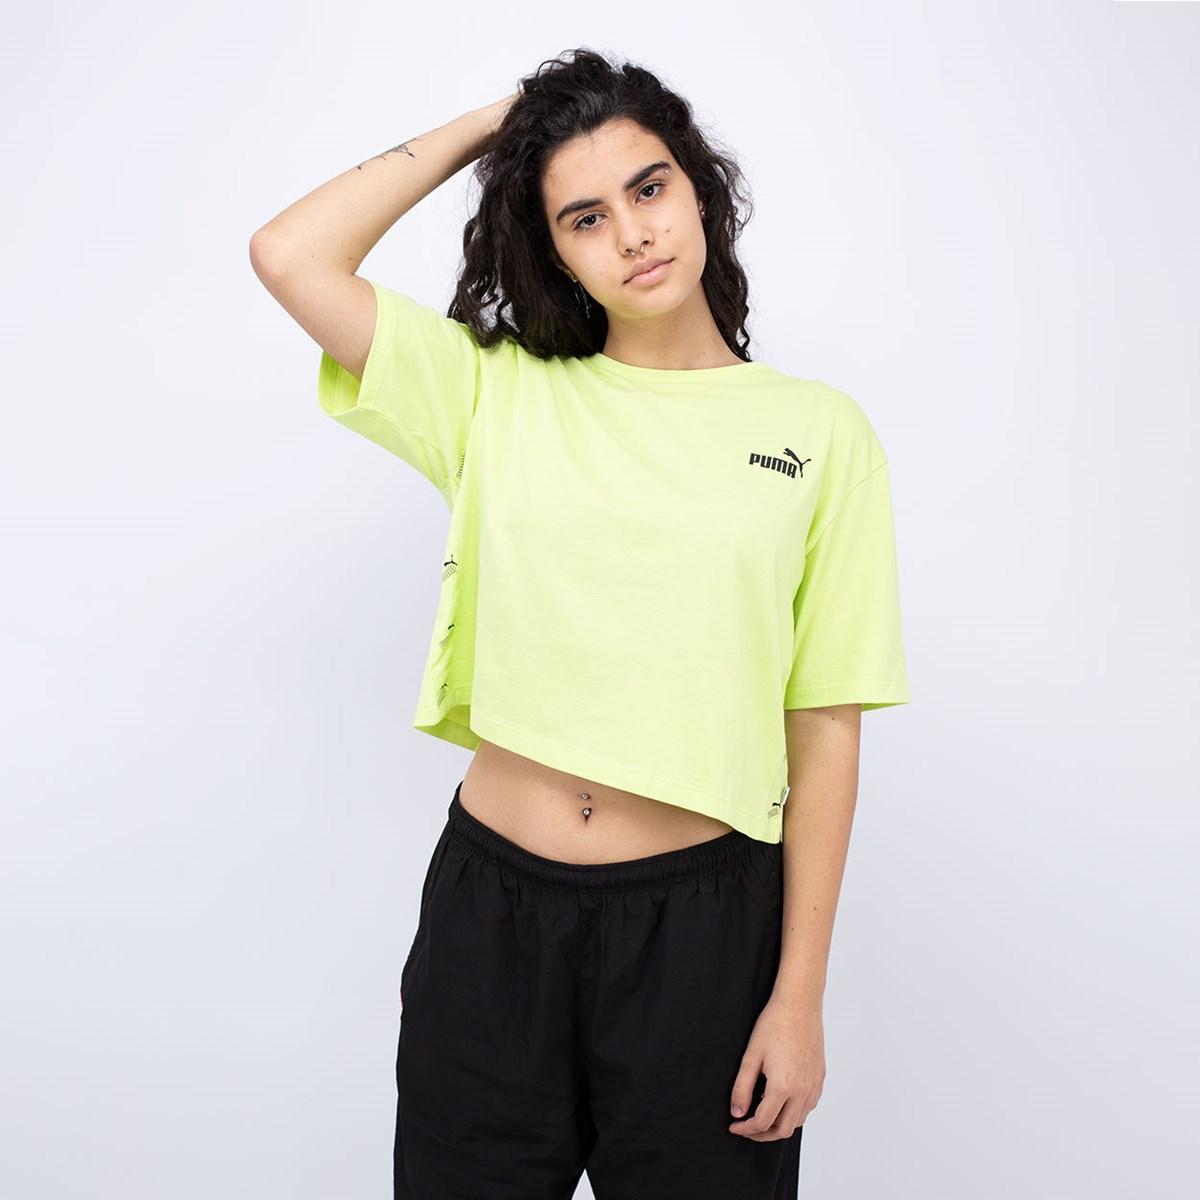 Camiseta Puma Amplified Sharp Green 583609-34